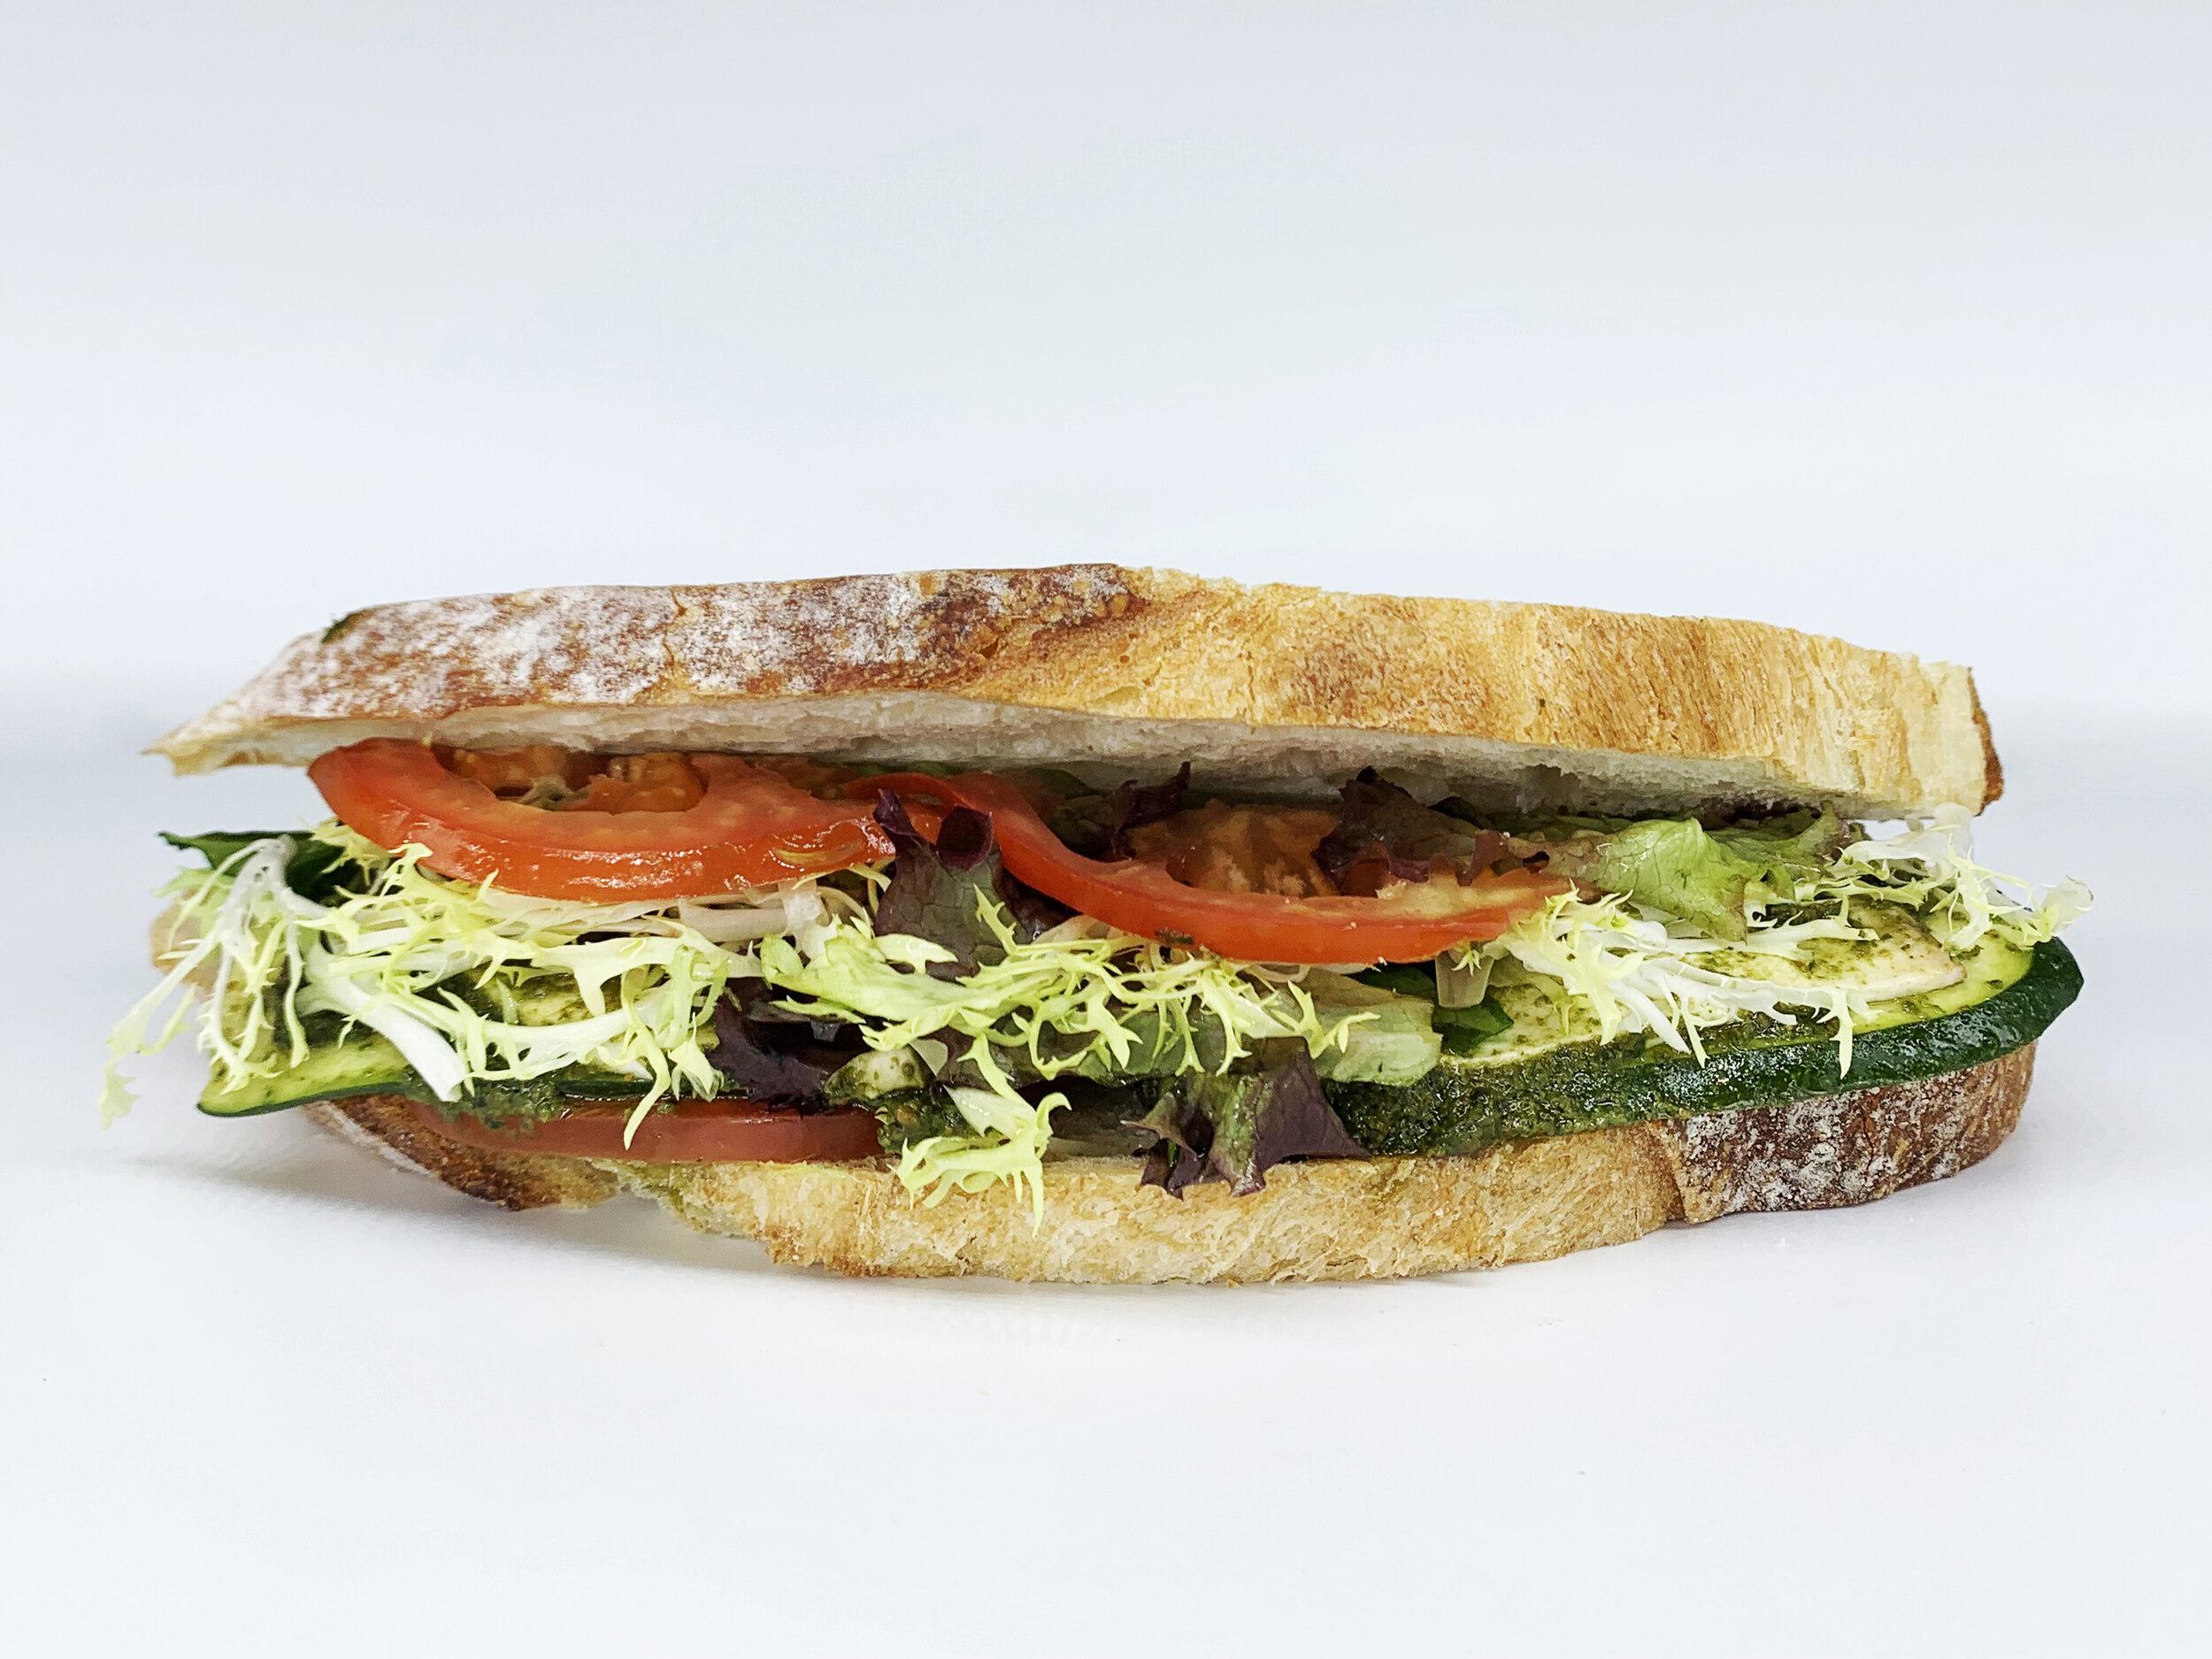 VEGGIE SOURDOUGH - 403.97 KCAL PER SERVINGeggplant, tomato, cucumber, yam, butter lettuce, sourdough bread, vegan mayo, zucchini$32